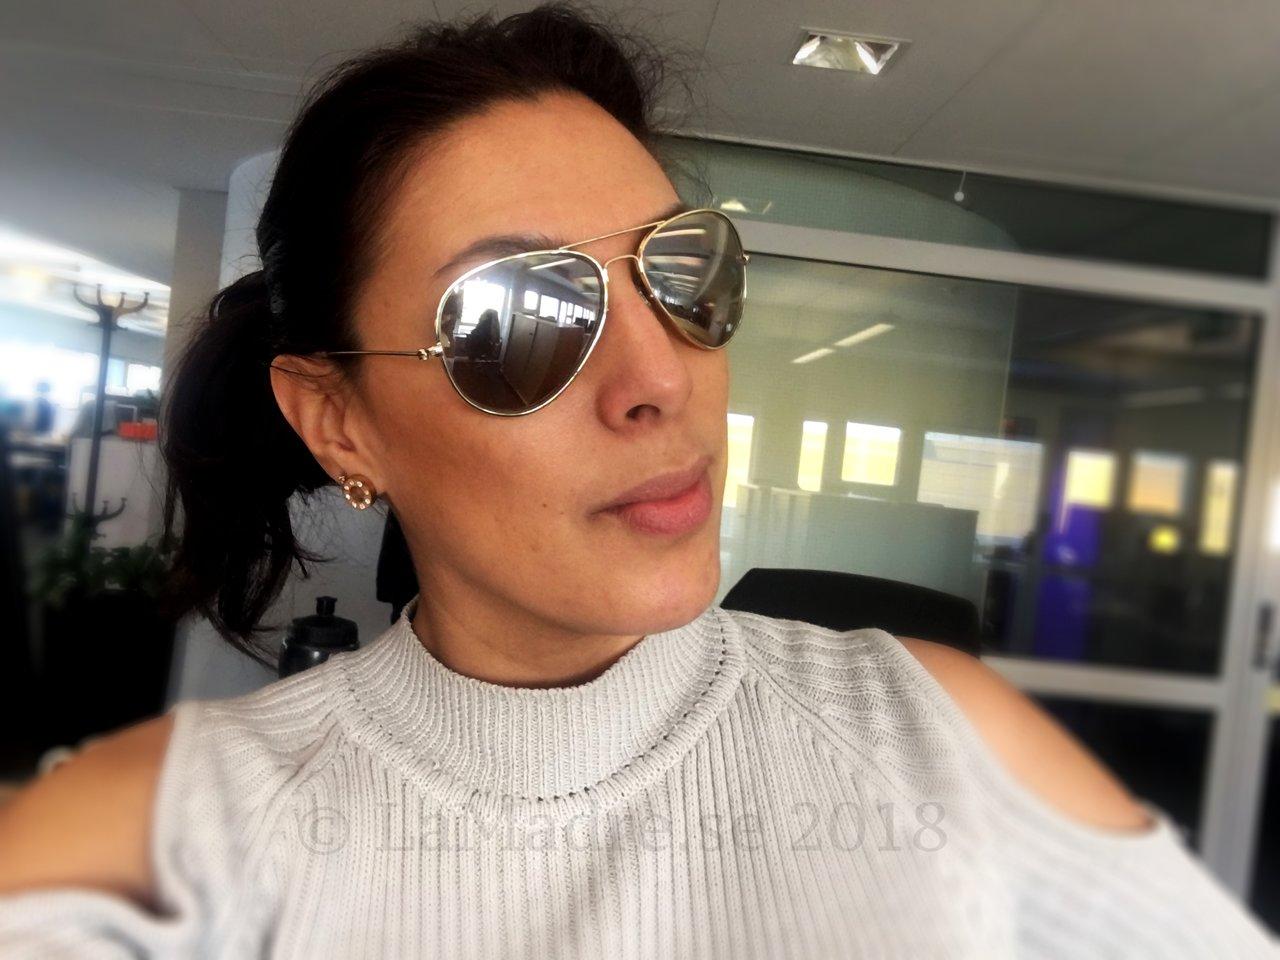 at_work_jobba_kontoret_face_latina_selfie_jag_me_worklife